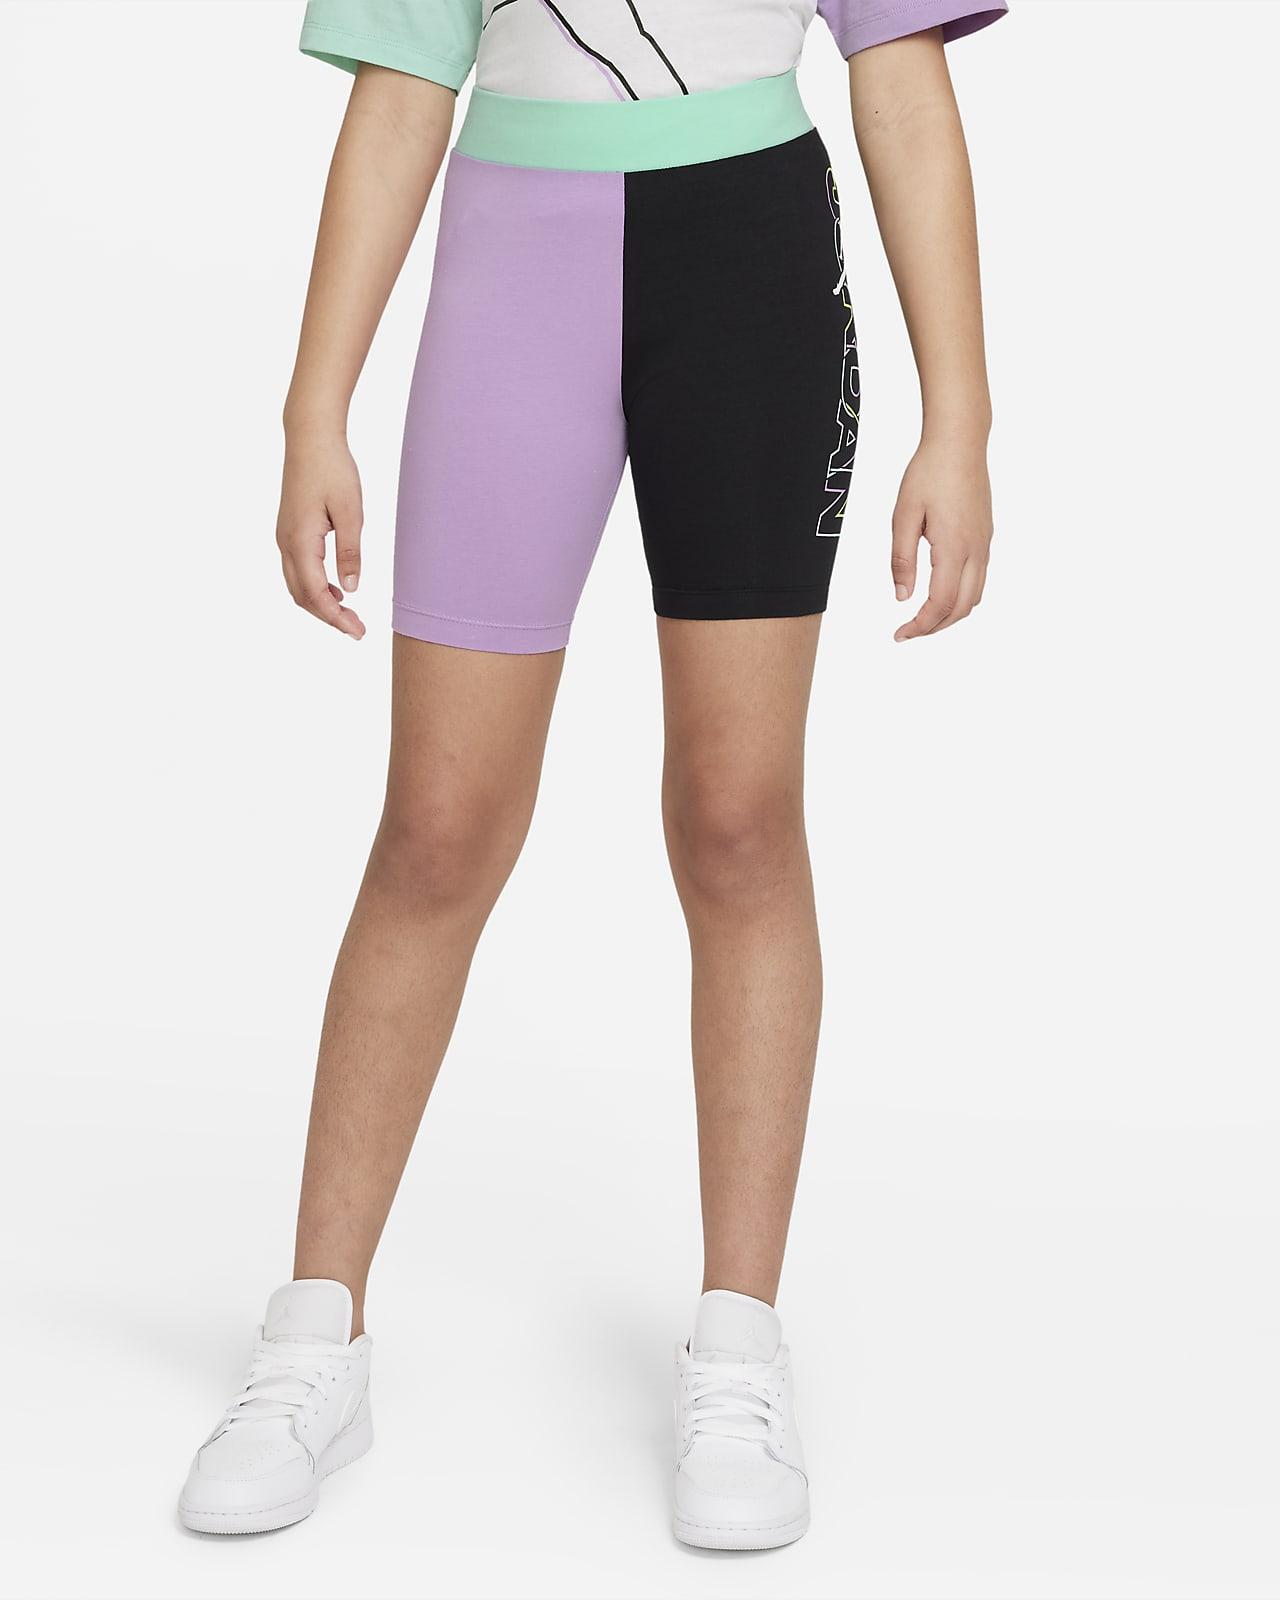 Jordan Big Kids' (Girls') High-Waisted Bike Shorts